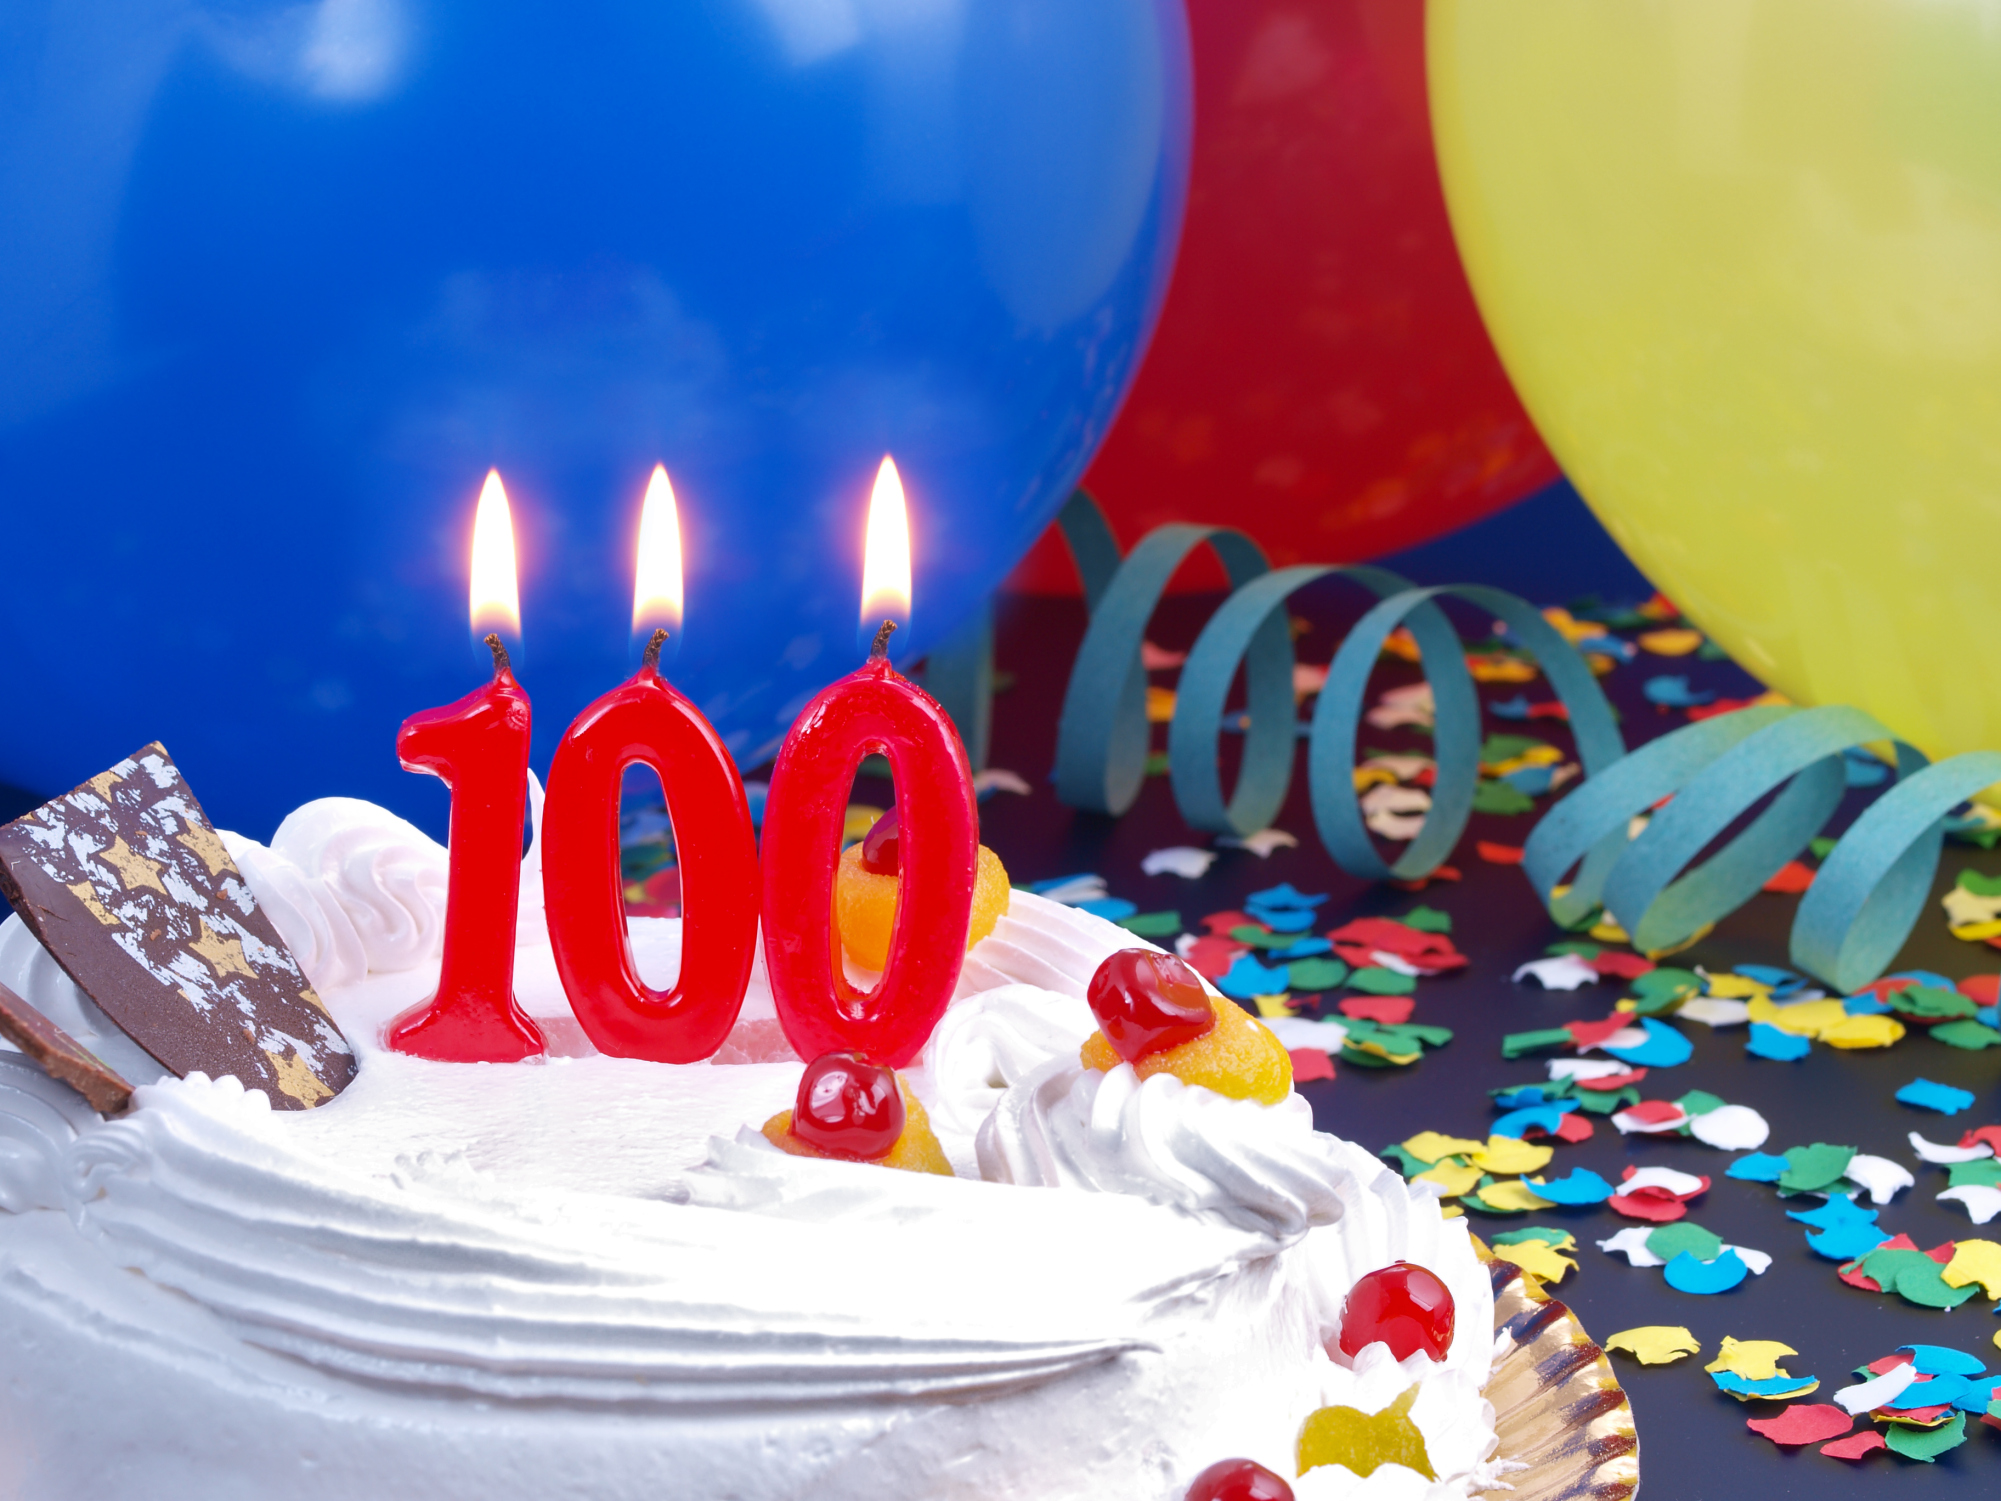 Birthday Ideas for Grandmas Turning 100 Years Old